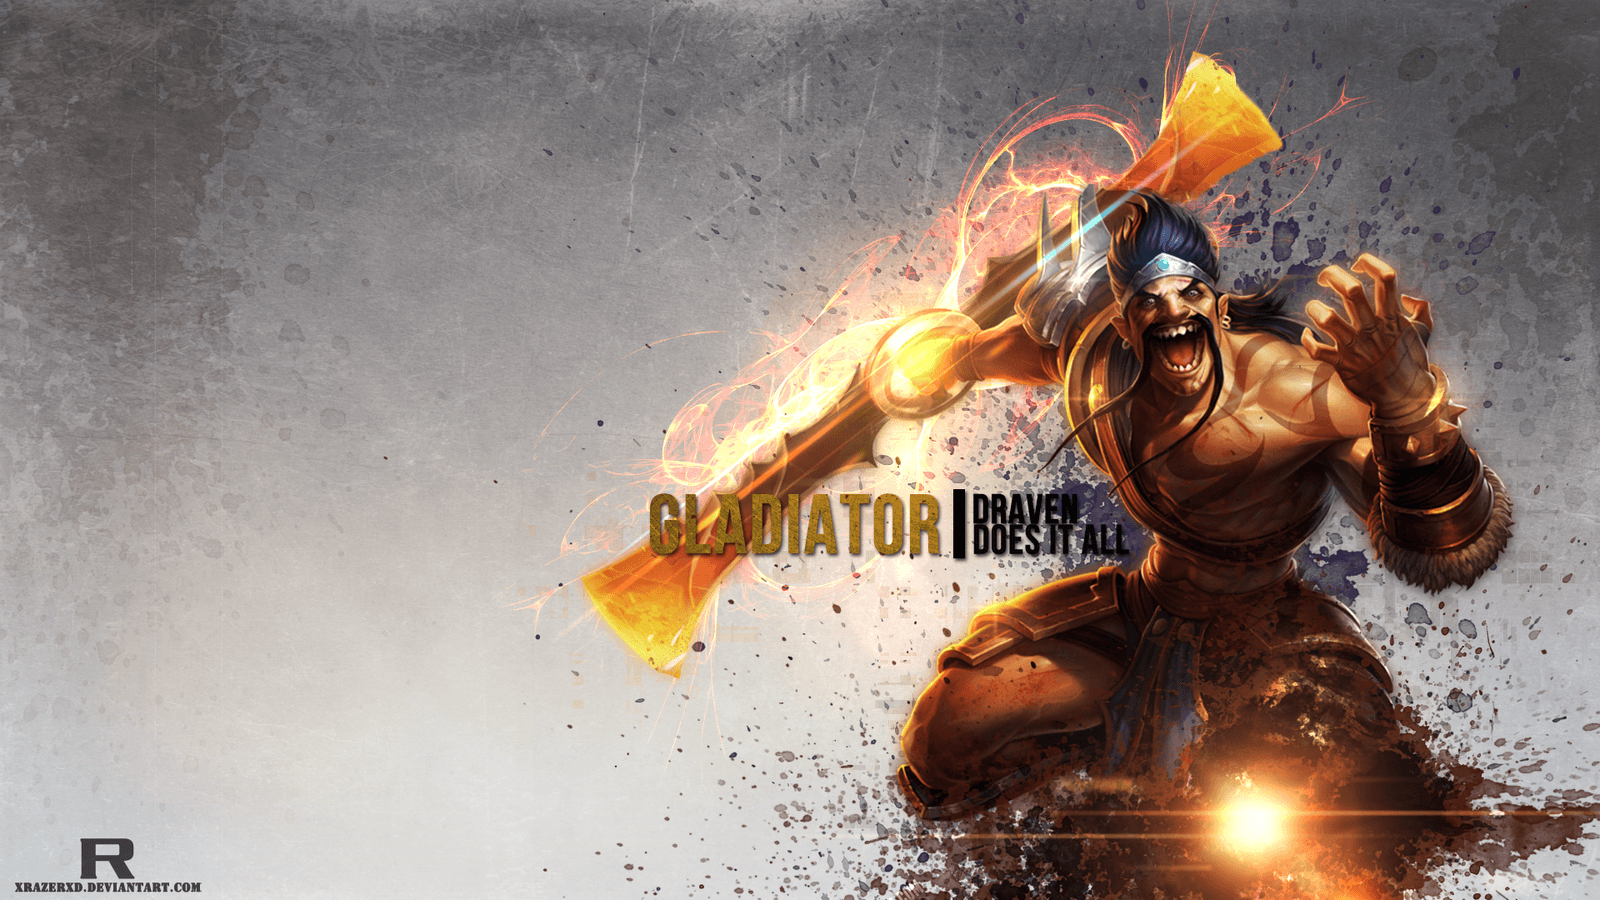 LoL -Gladiator Draven Wallpaper by xRazerxD on DeviantArt